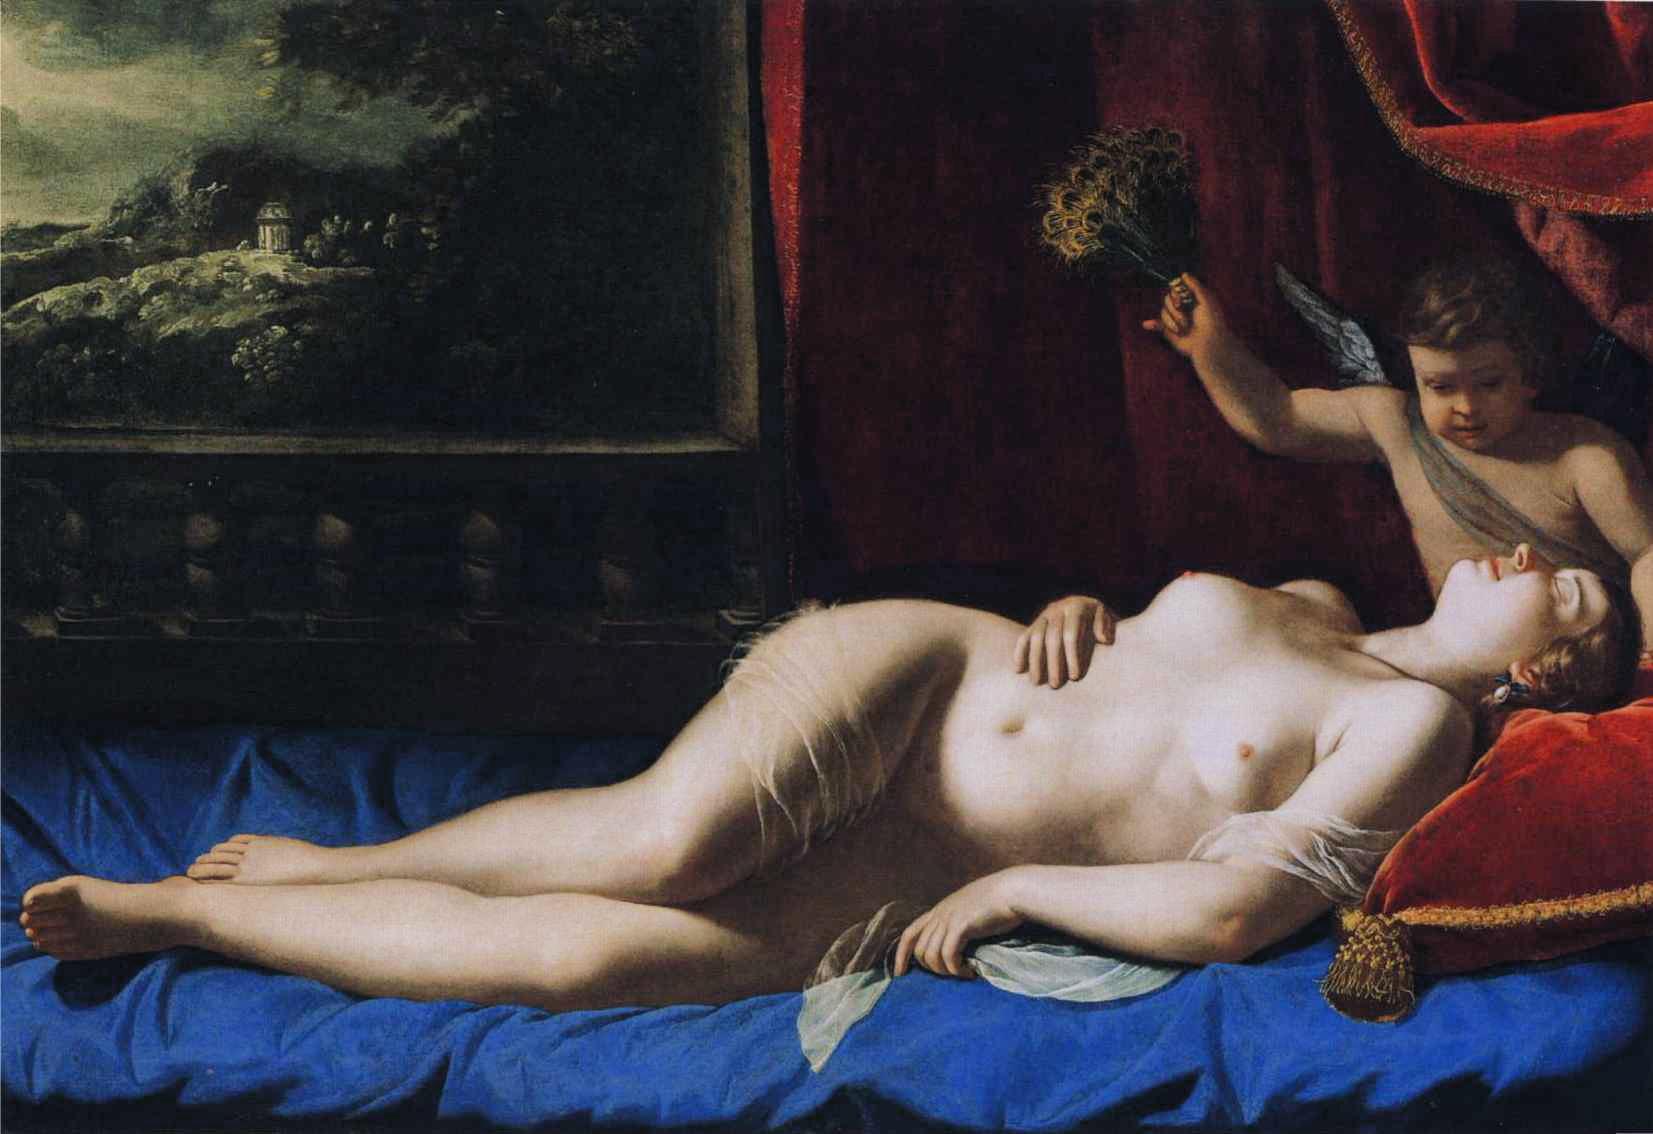 Artemisia Gentileschi, Sleeping Venus, 1625